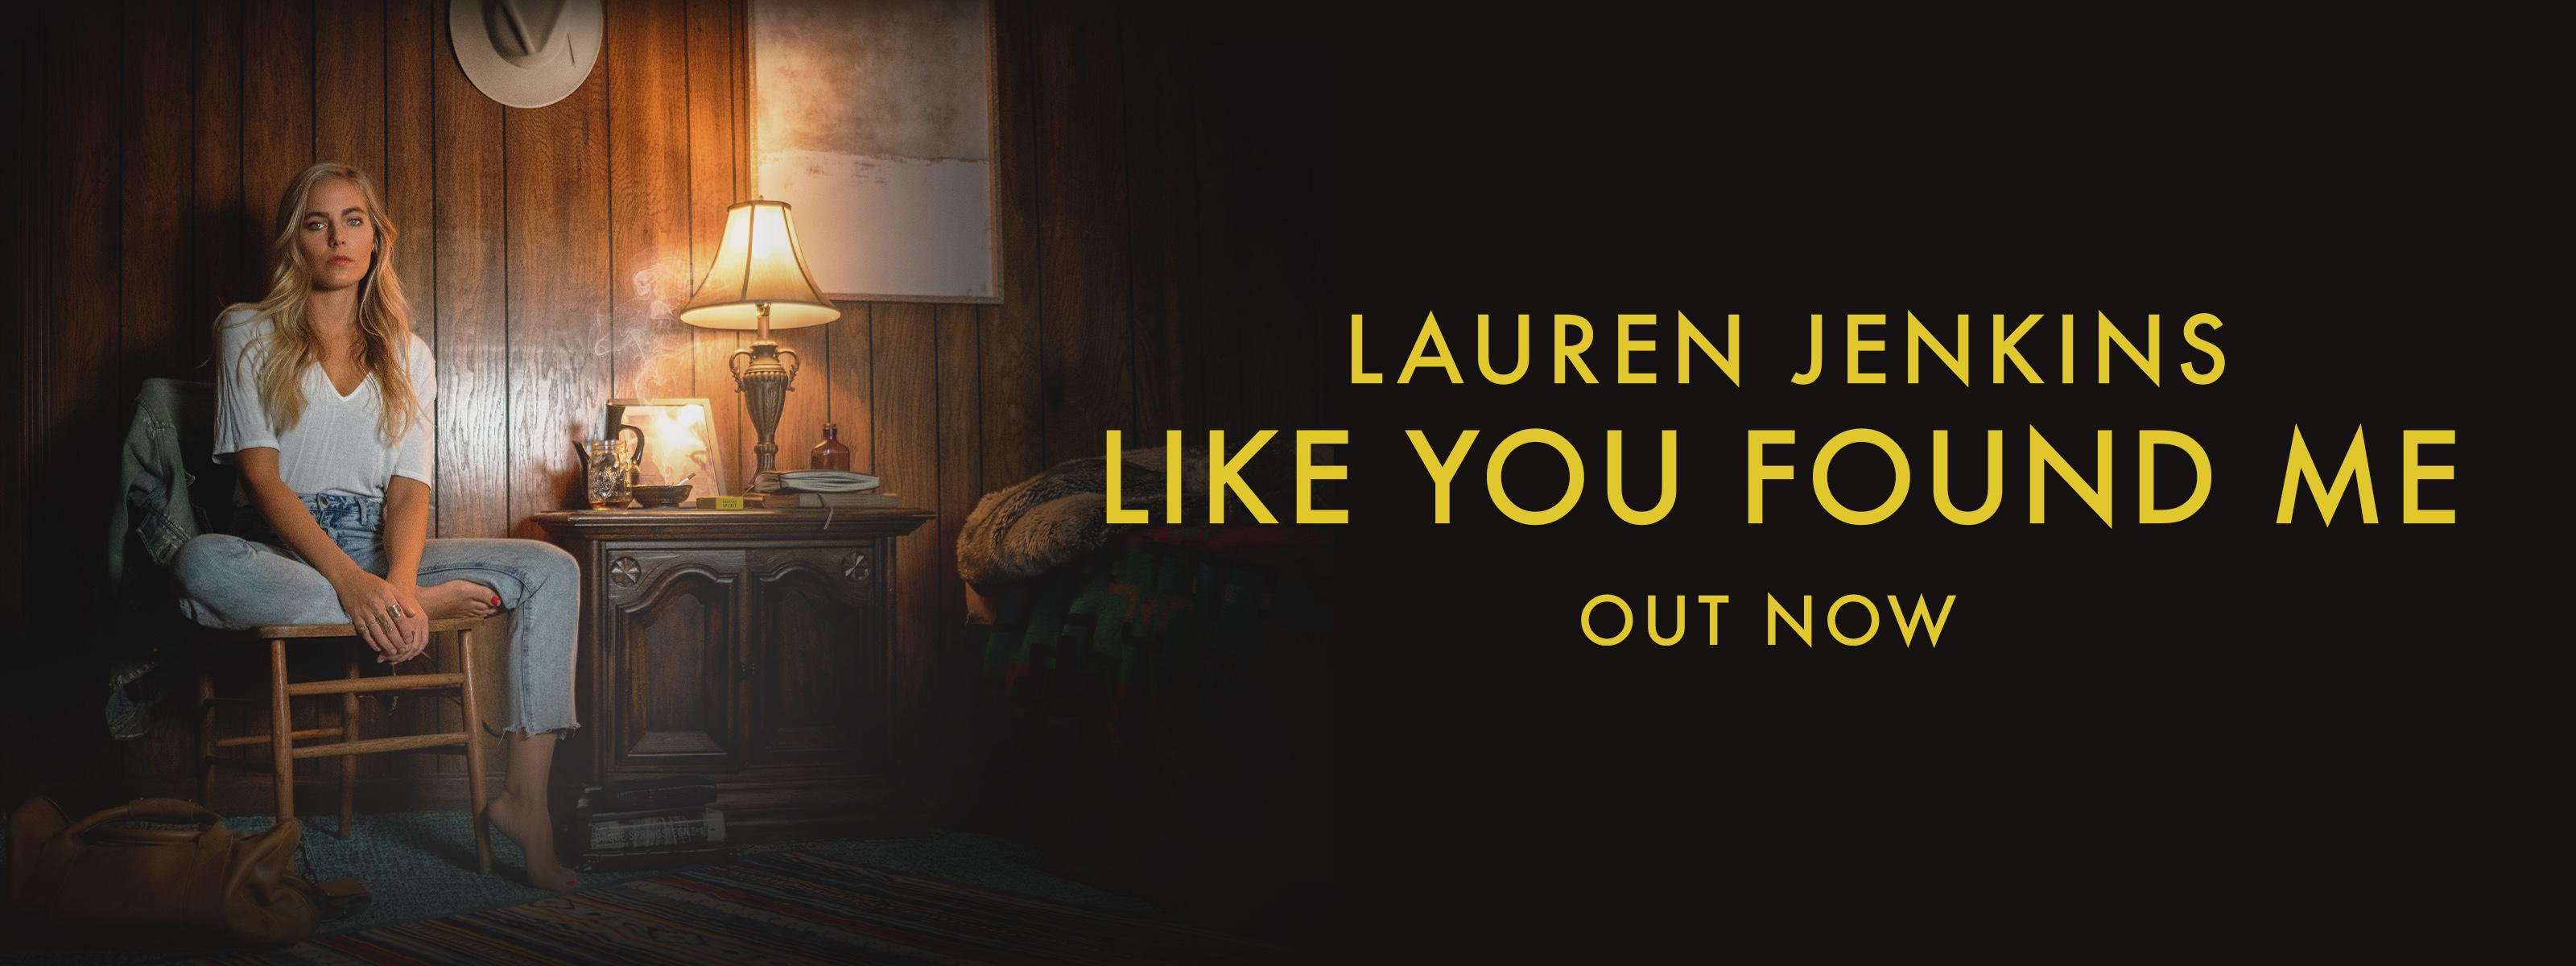 Lauren Jenkins like you found me